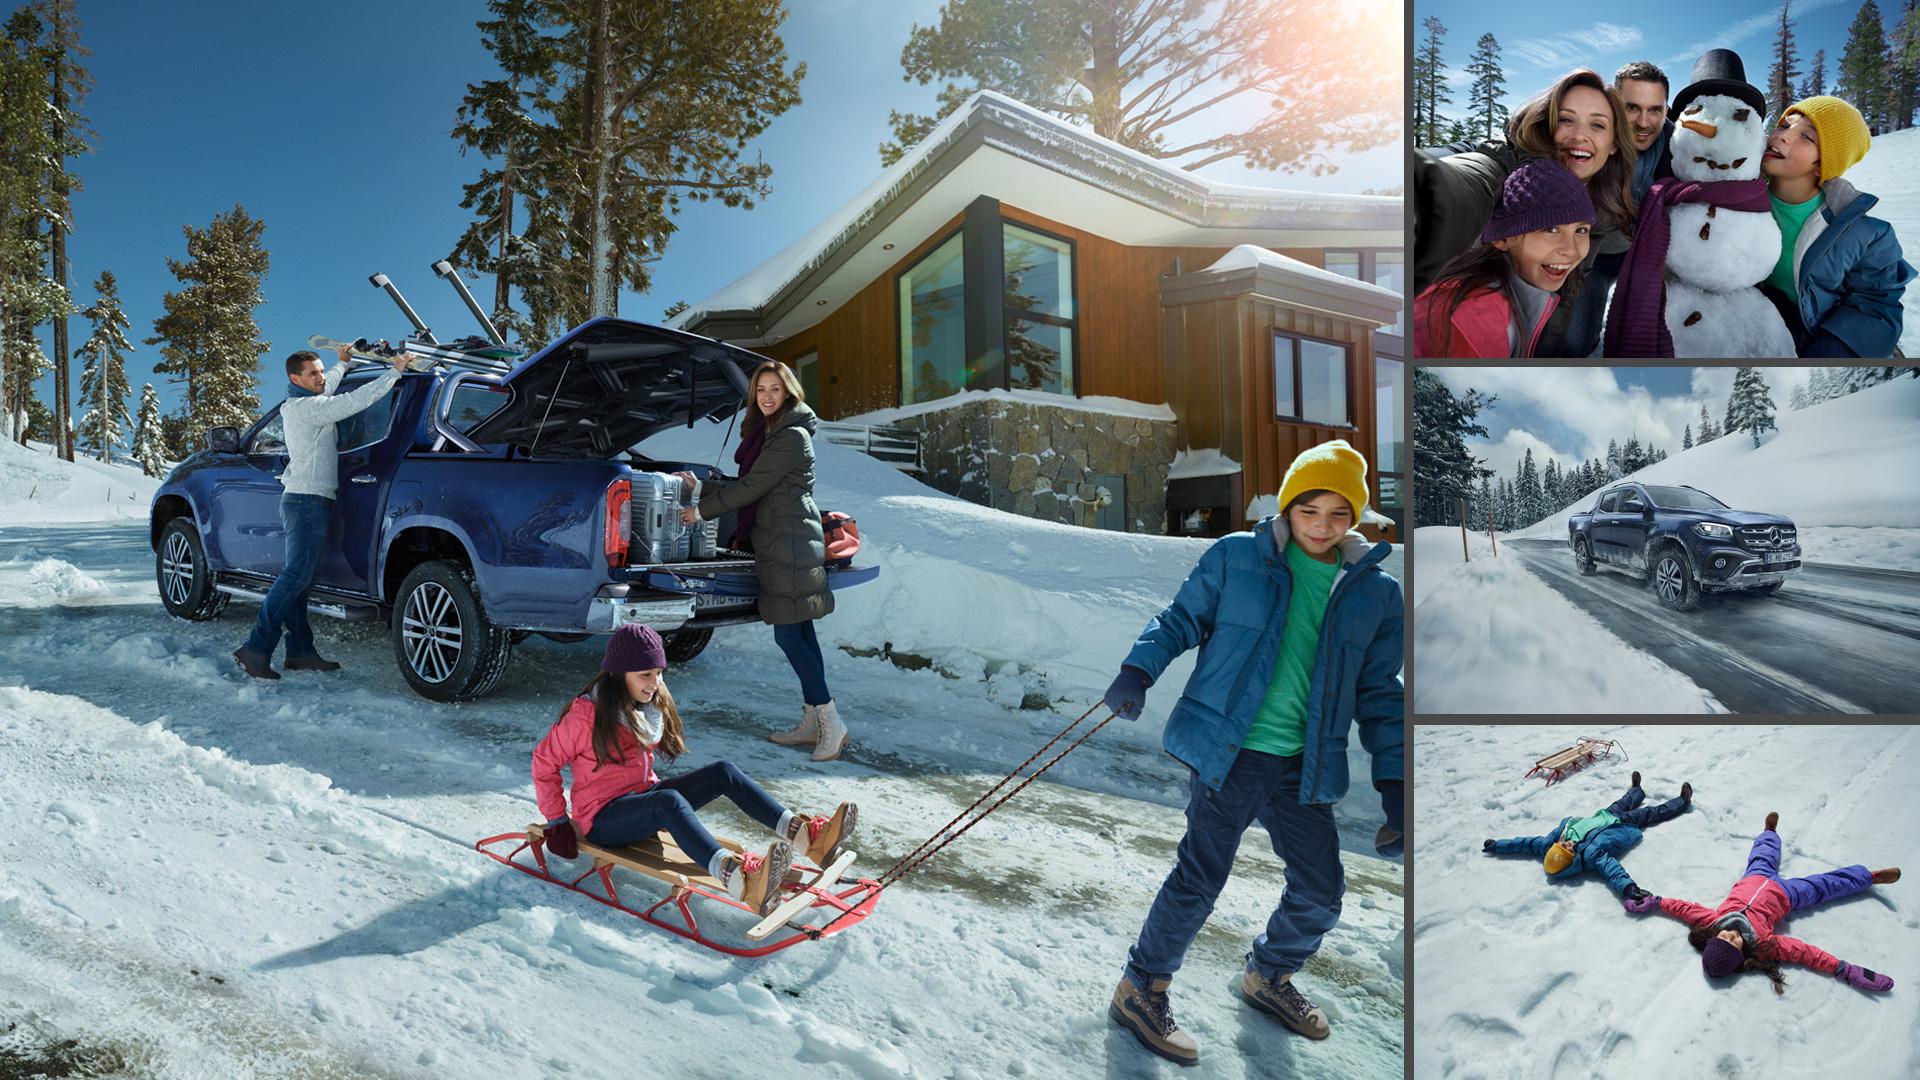 ©ankeluckmann x snow, Mercedes Benz X-Klasse, Anke Luckmann, ©ankeluckmann, campaign, LLR, kai tietz, www.ankeluckmann.com, recom, snow, family